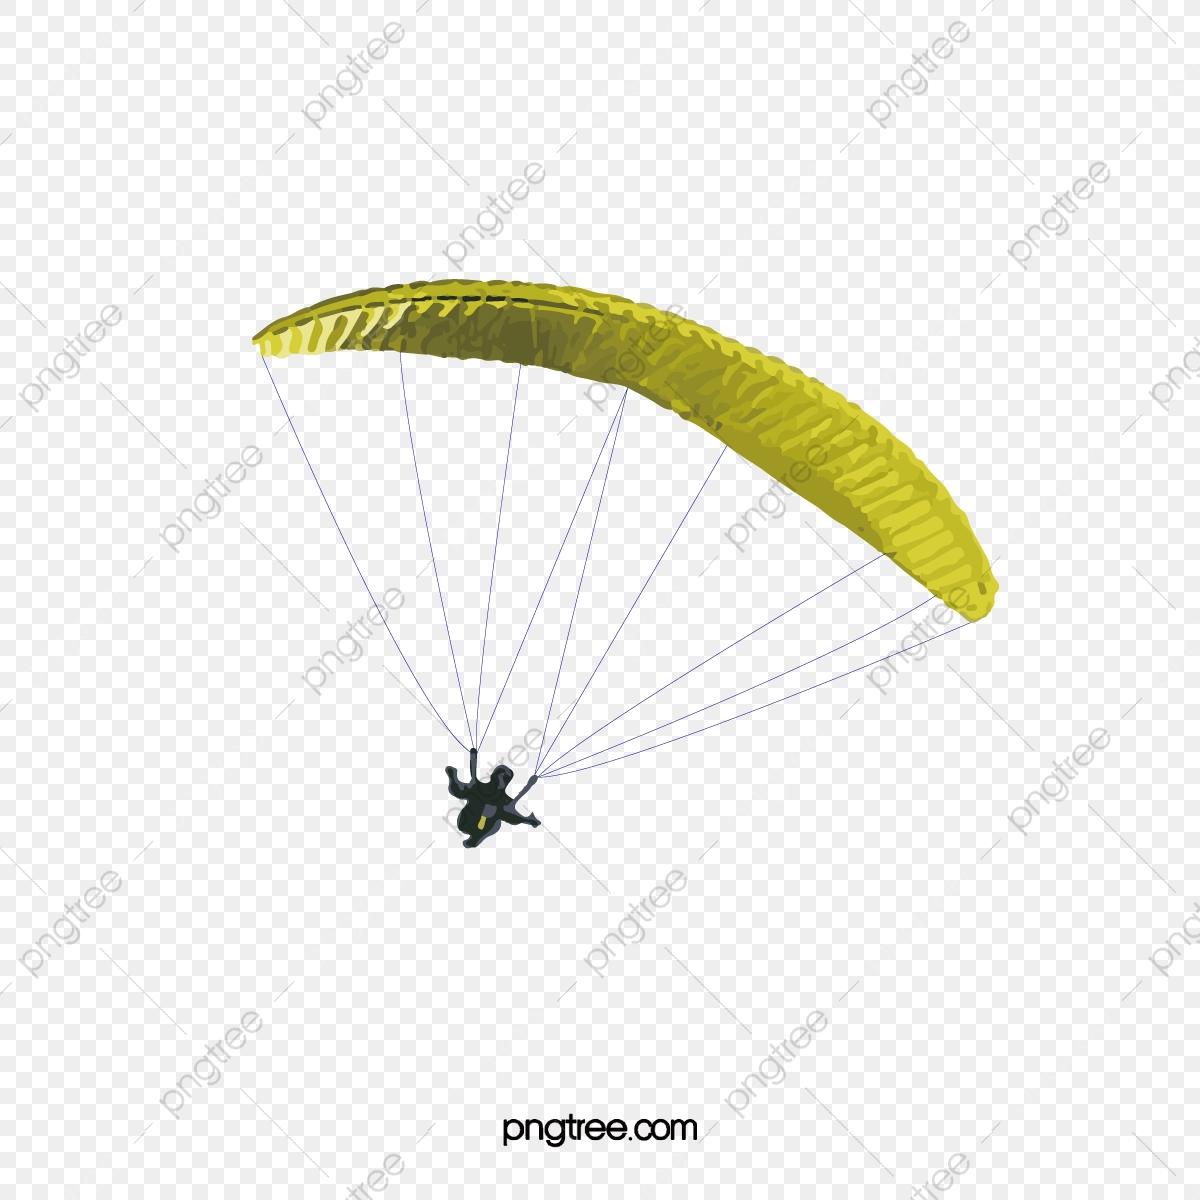 Paragliding, Gliding, Company Culture, Sky PNG Transparent.